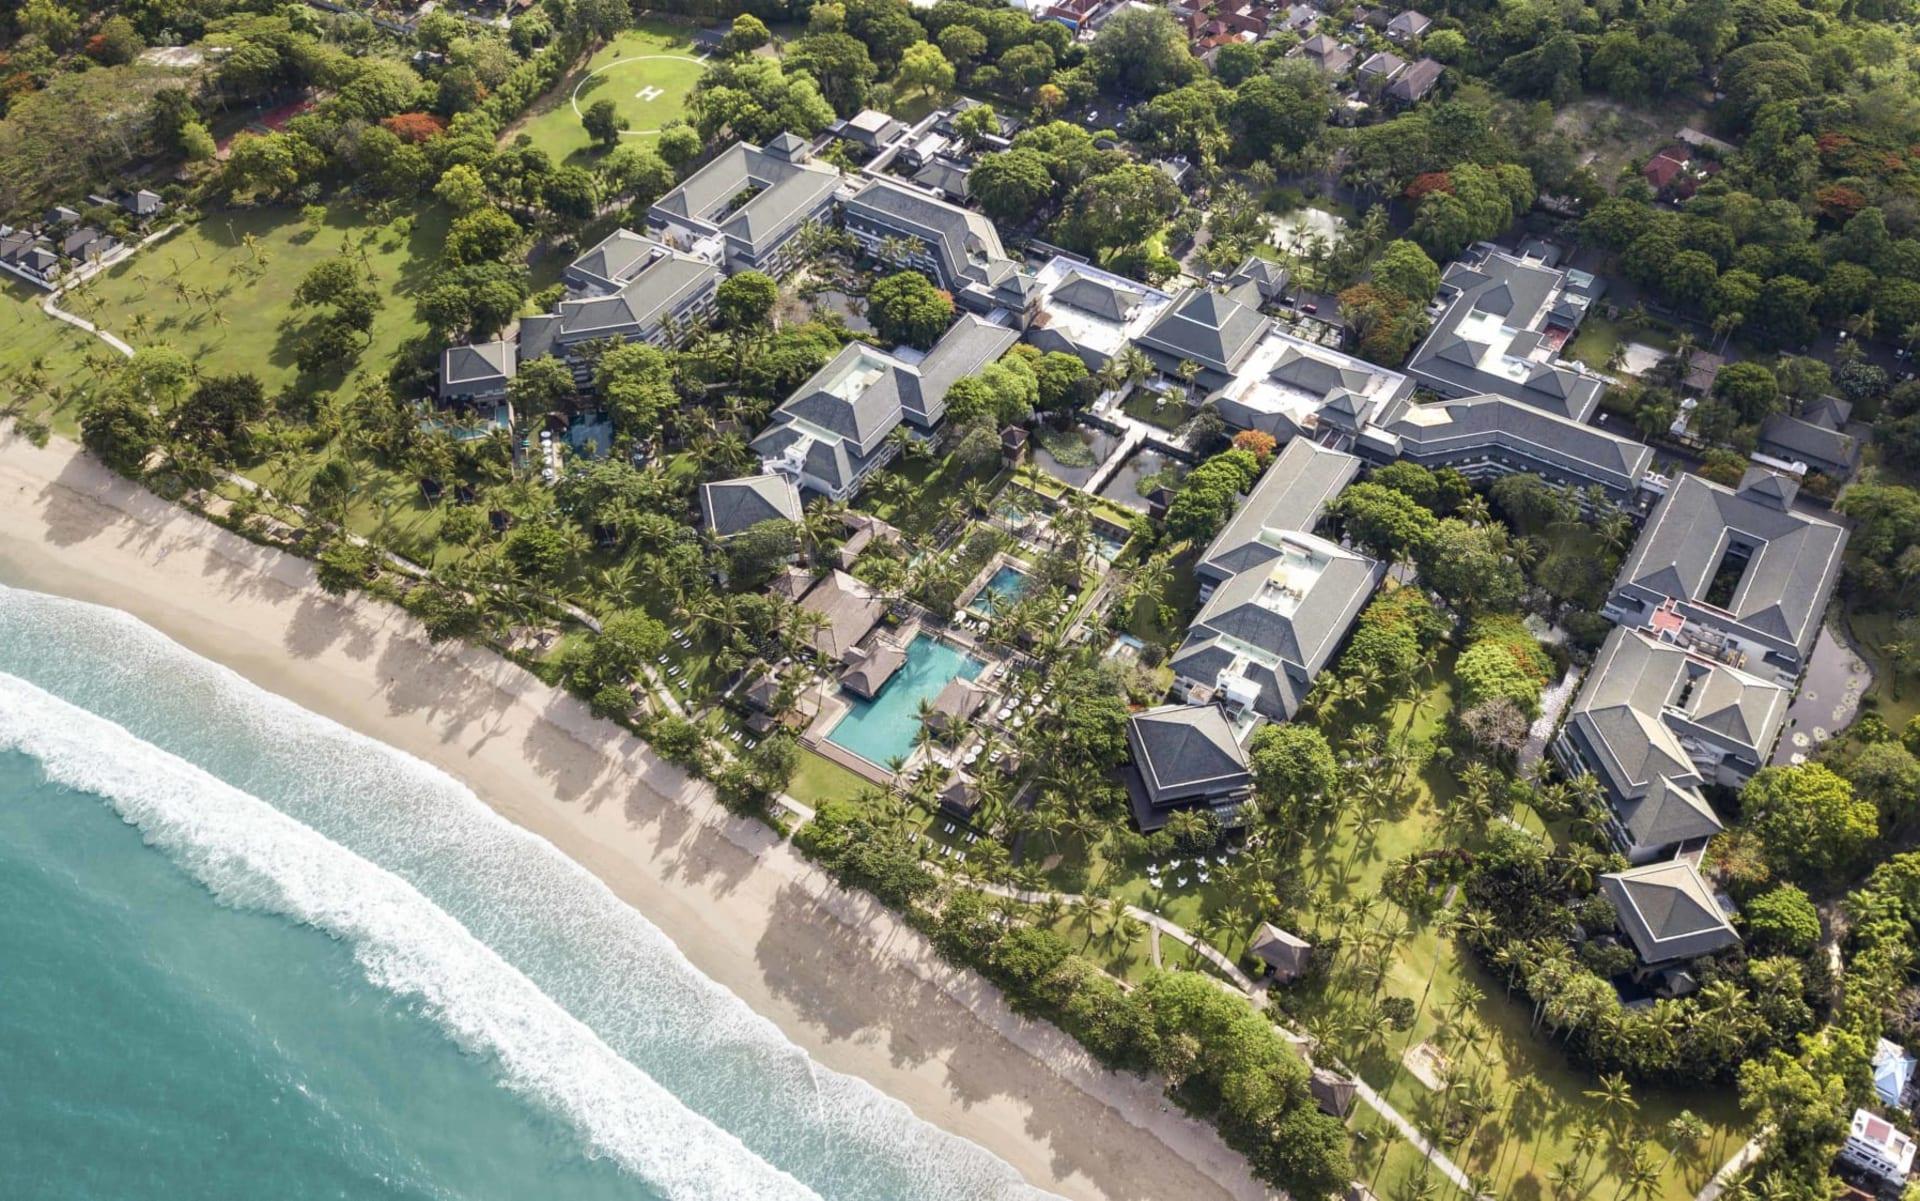 InterContinental Bali Resort in Südbali: Aerial